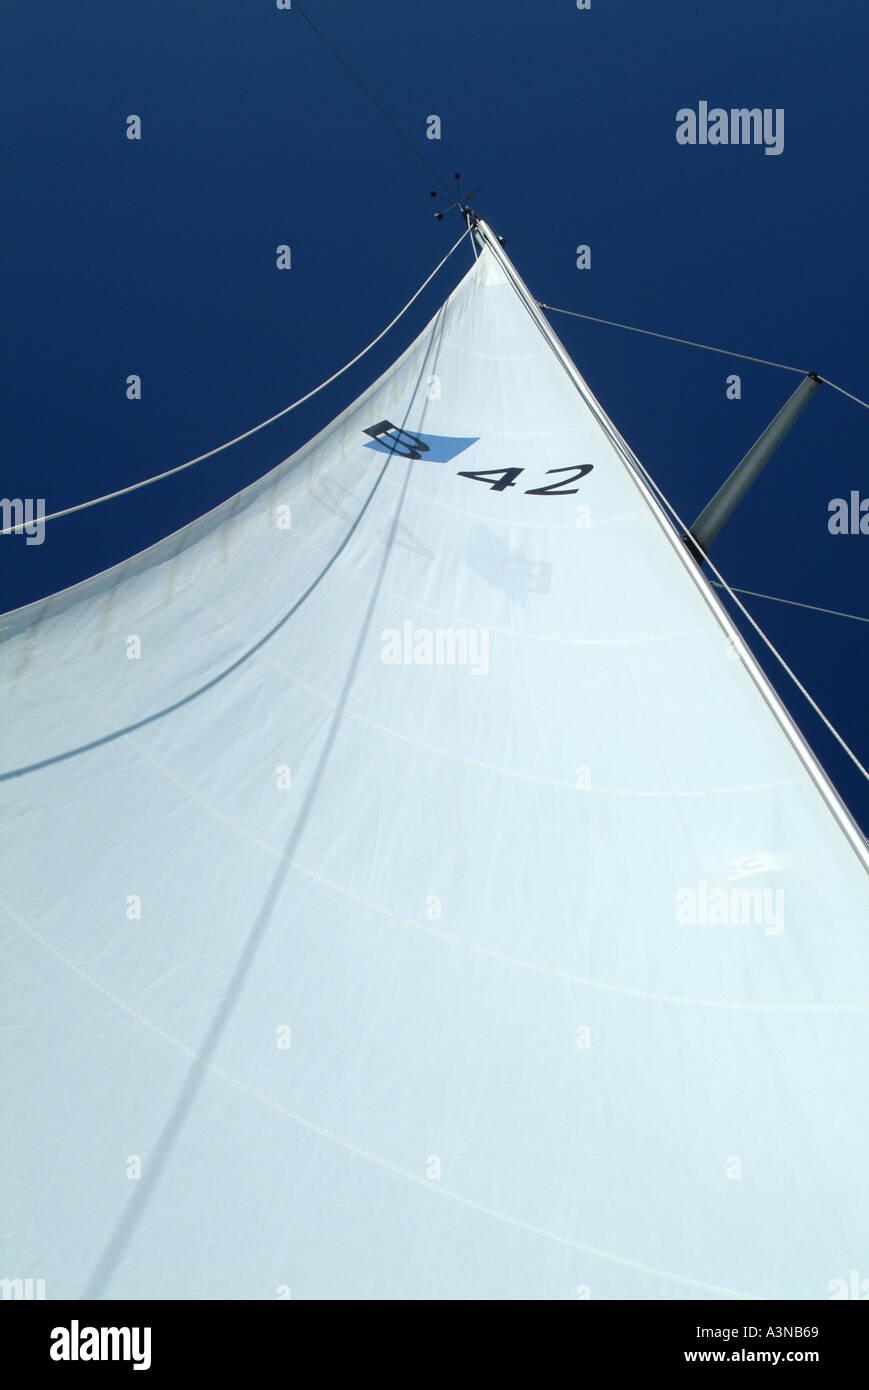 Mainsail of Bavarian 42 Yacht at Sea in Croatia - Stock Image